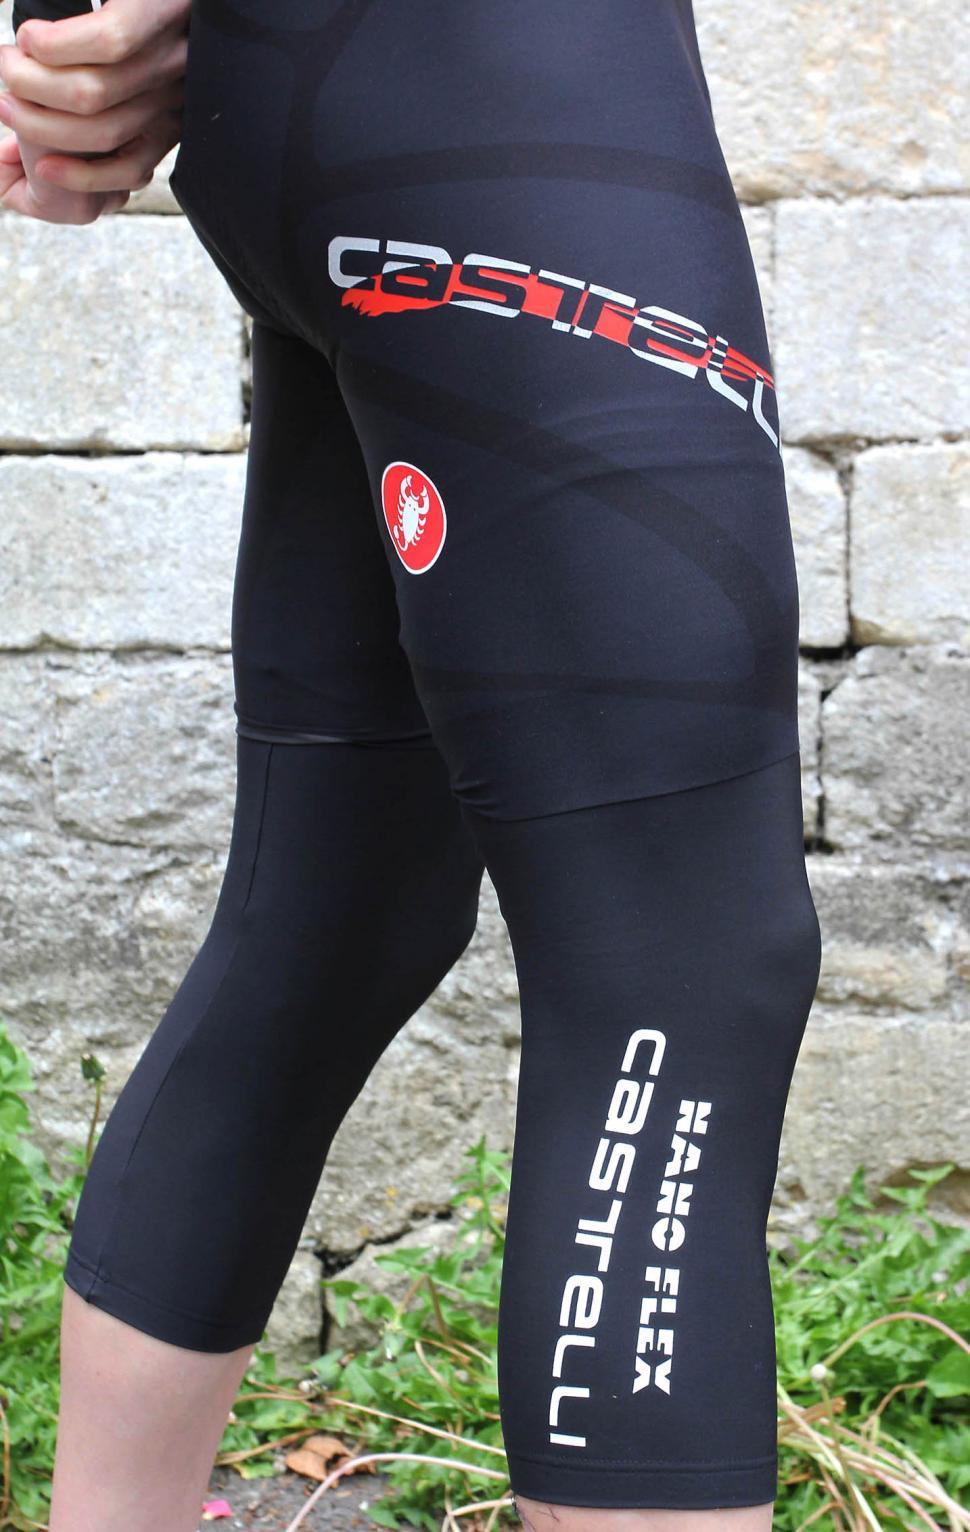 Castelli Nano Flex knee warmer